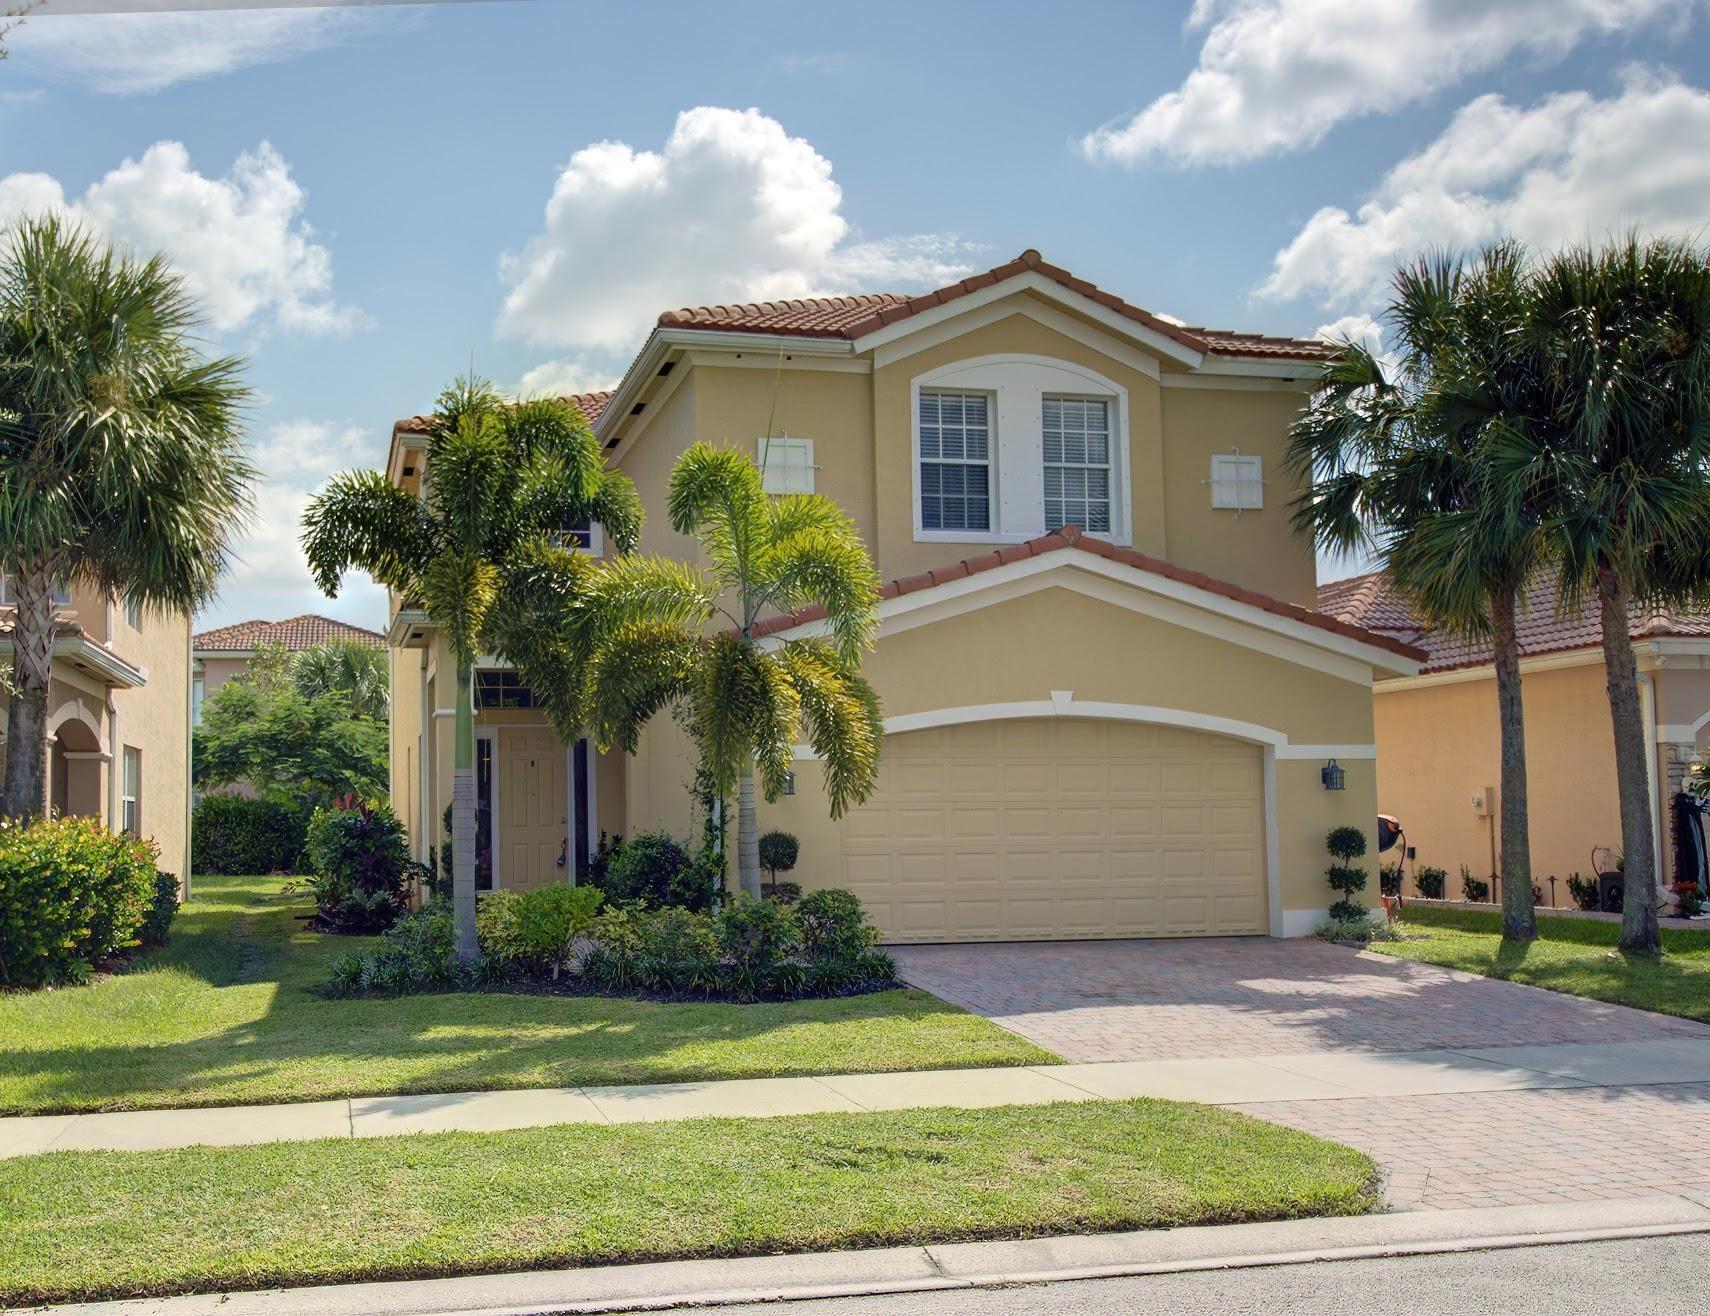 2266 NW Padova Street, Port Saint Lucie, FL 34986 - #: RX-10664700